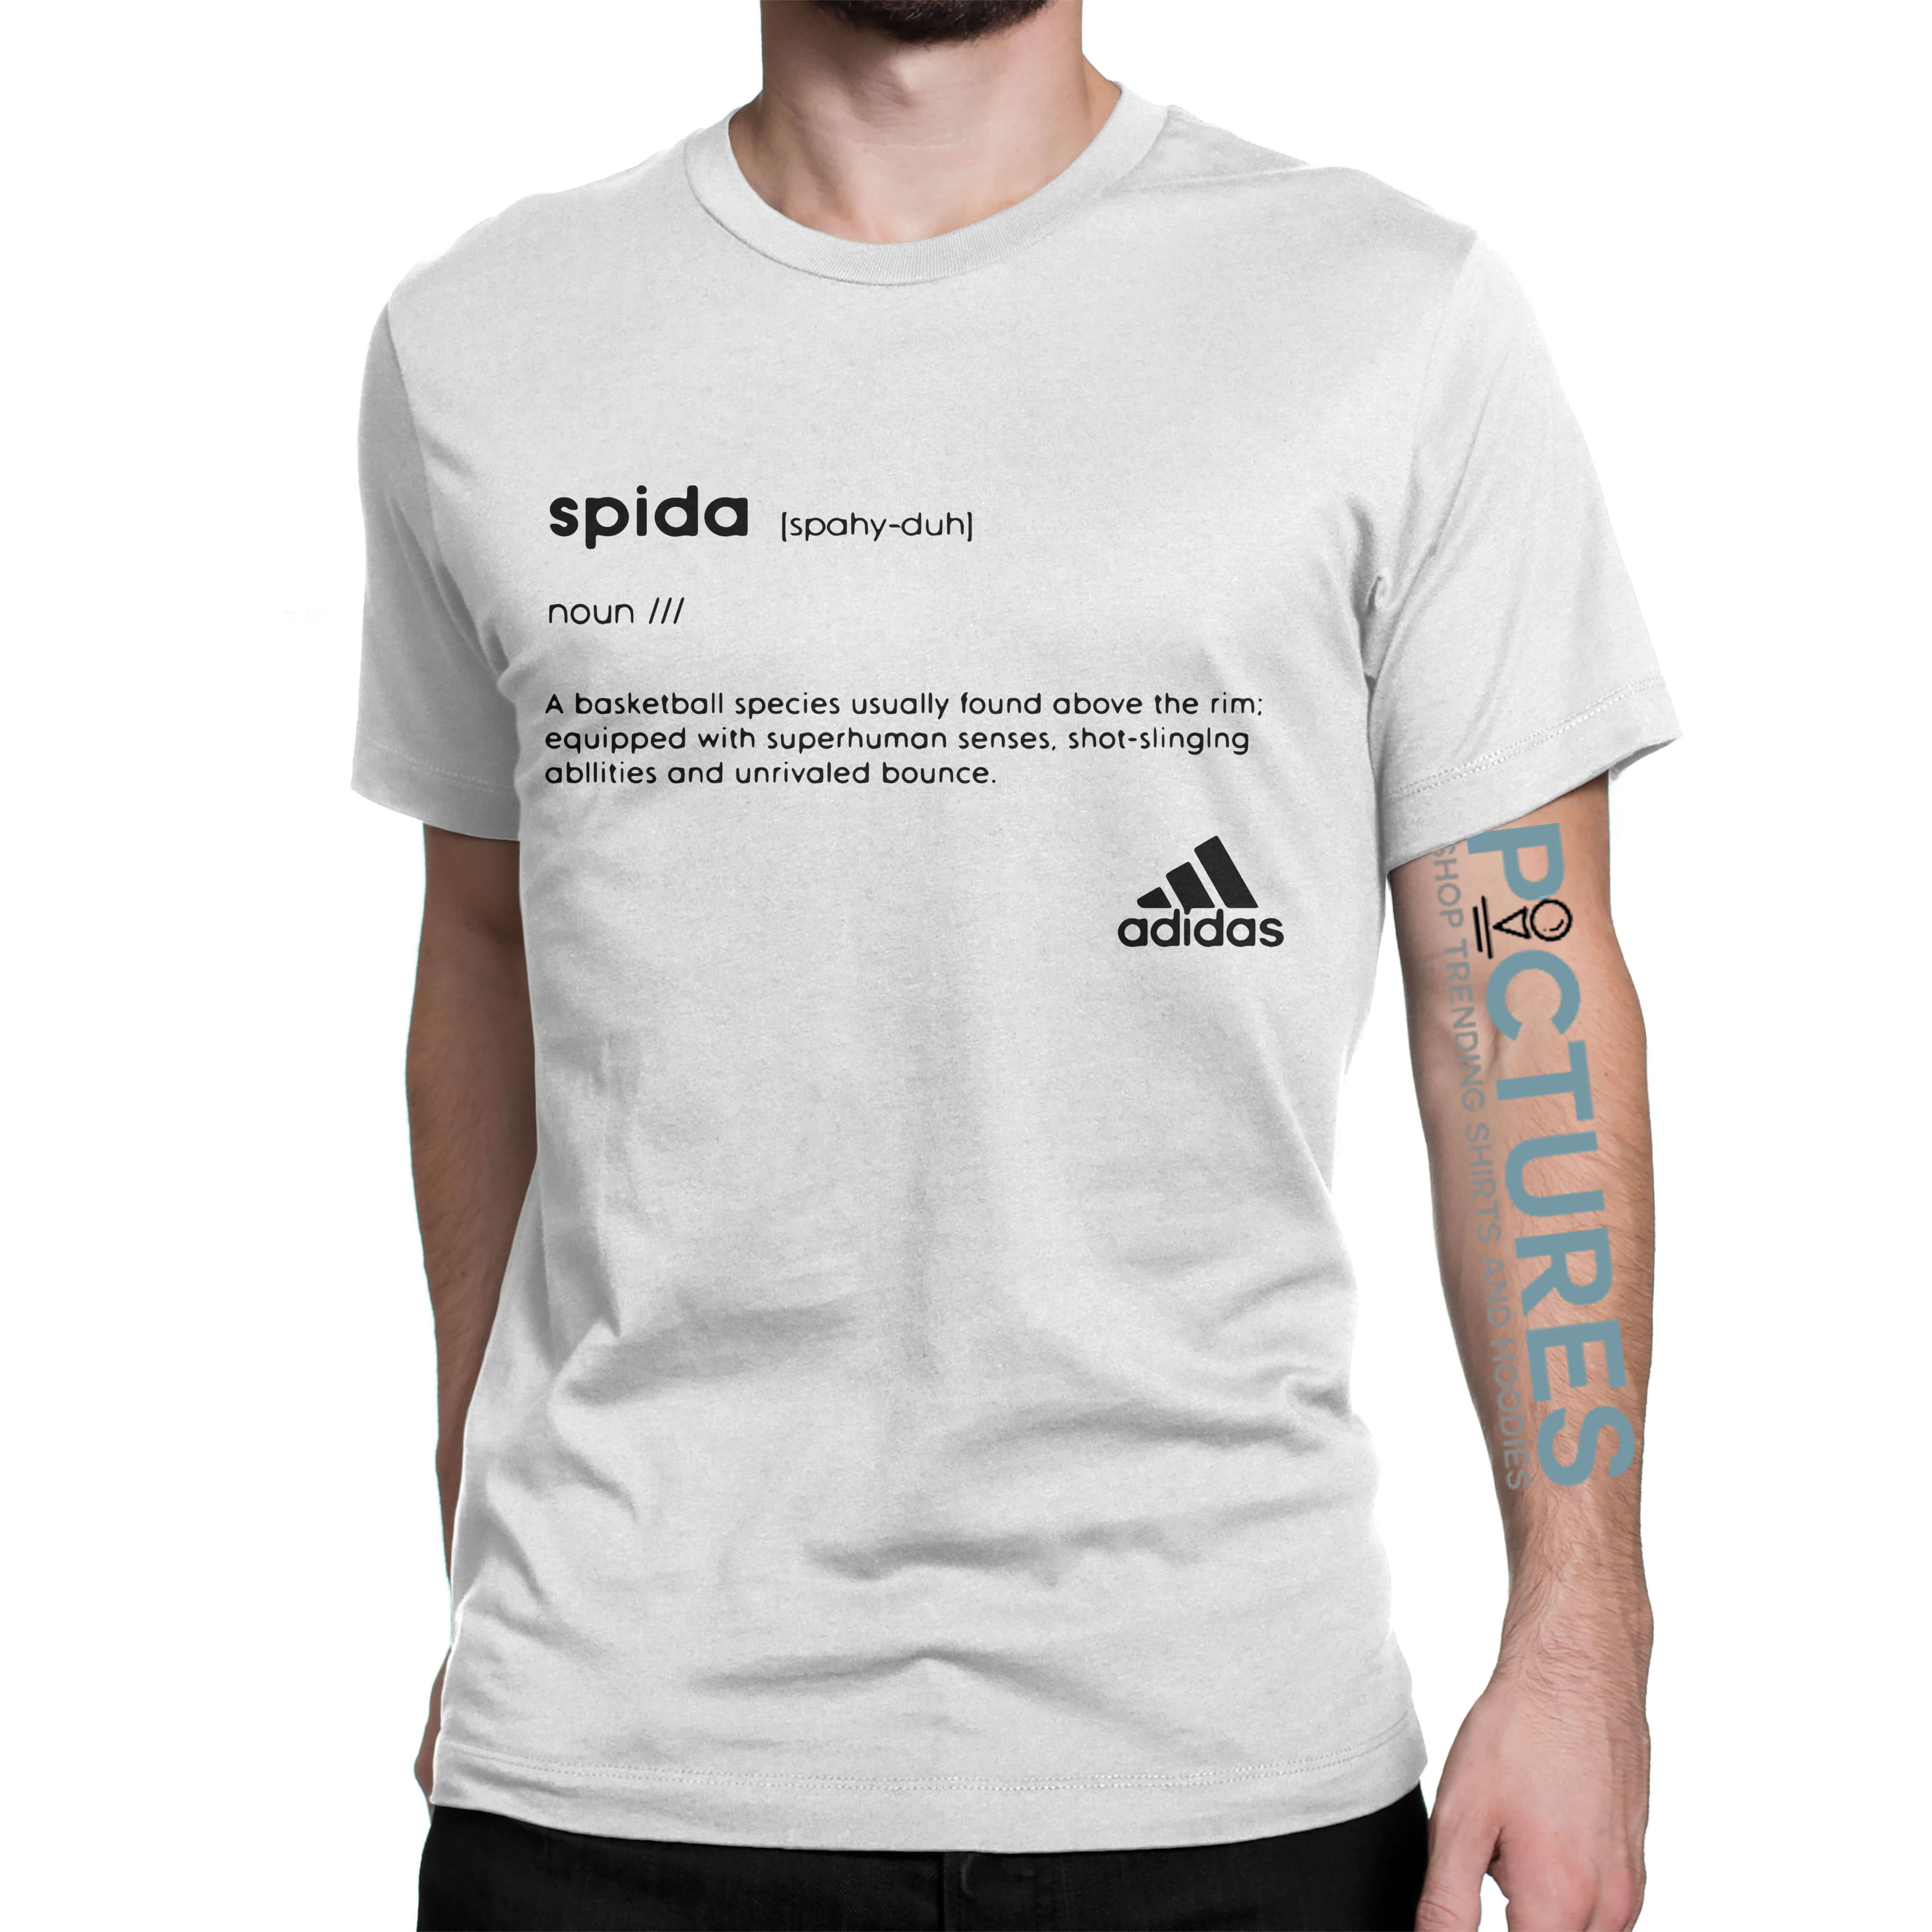 Donovan Mitchell Adidas Spida shirt